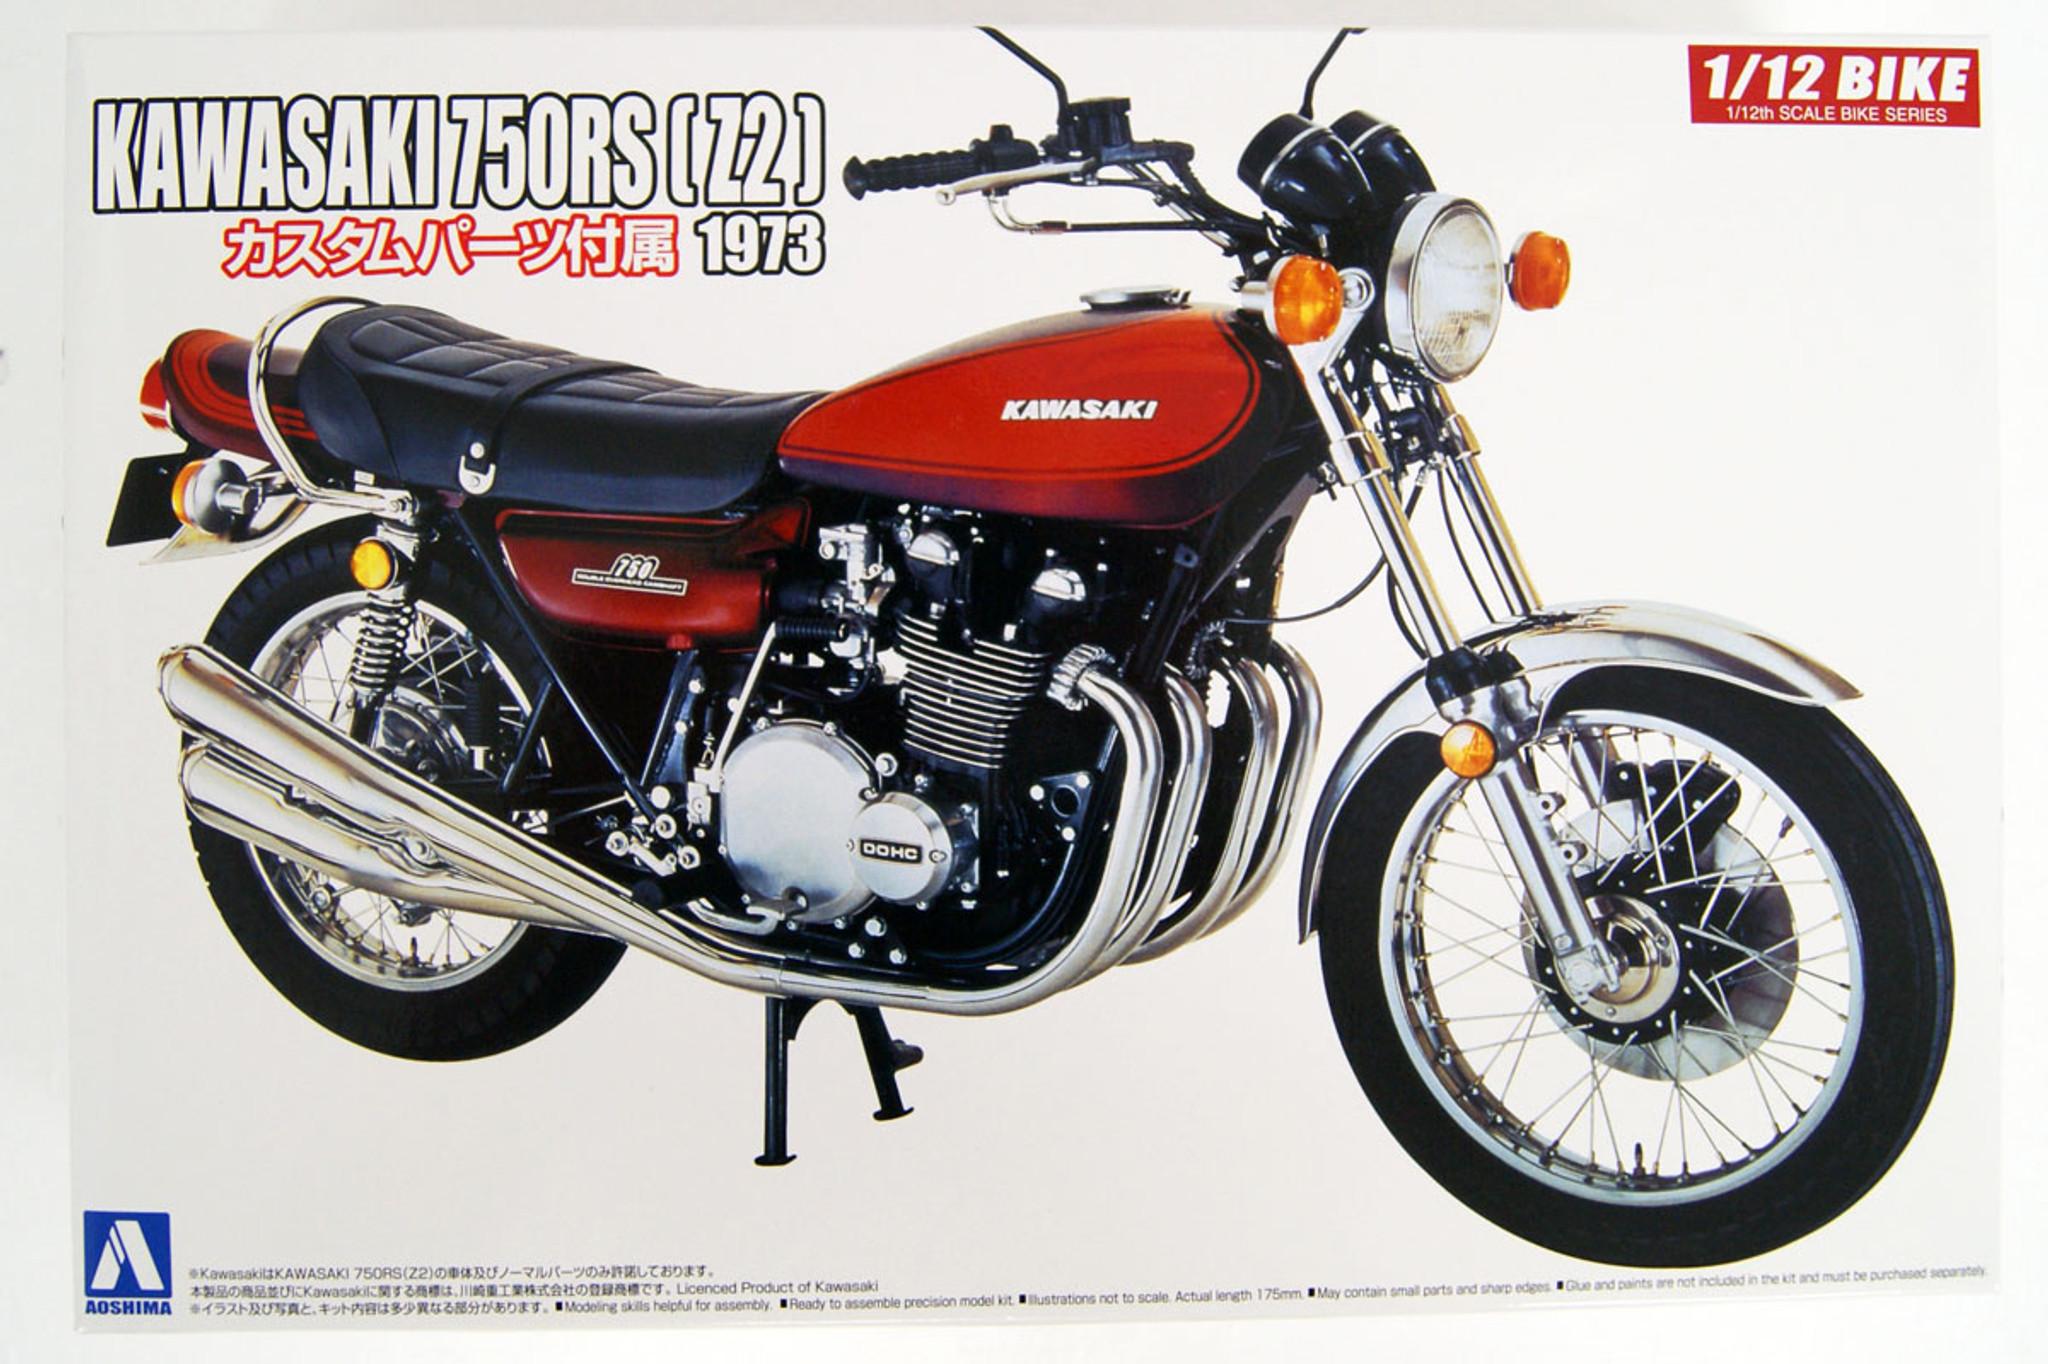 Aoshima 52983 Bike 32 Kawasaki 750RS(Z2) w/ Cutom Parts 1/12 scale